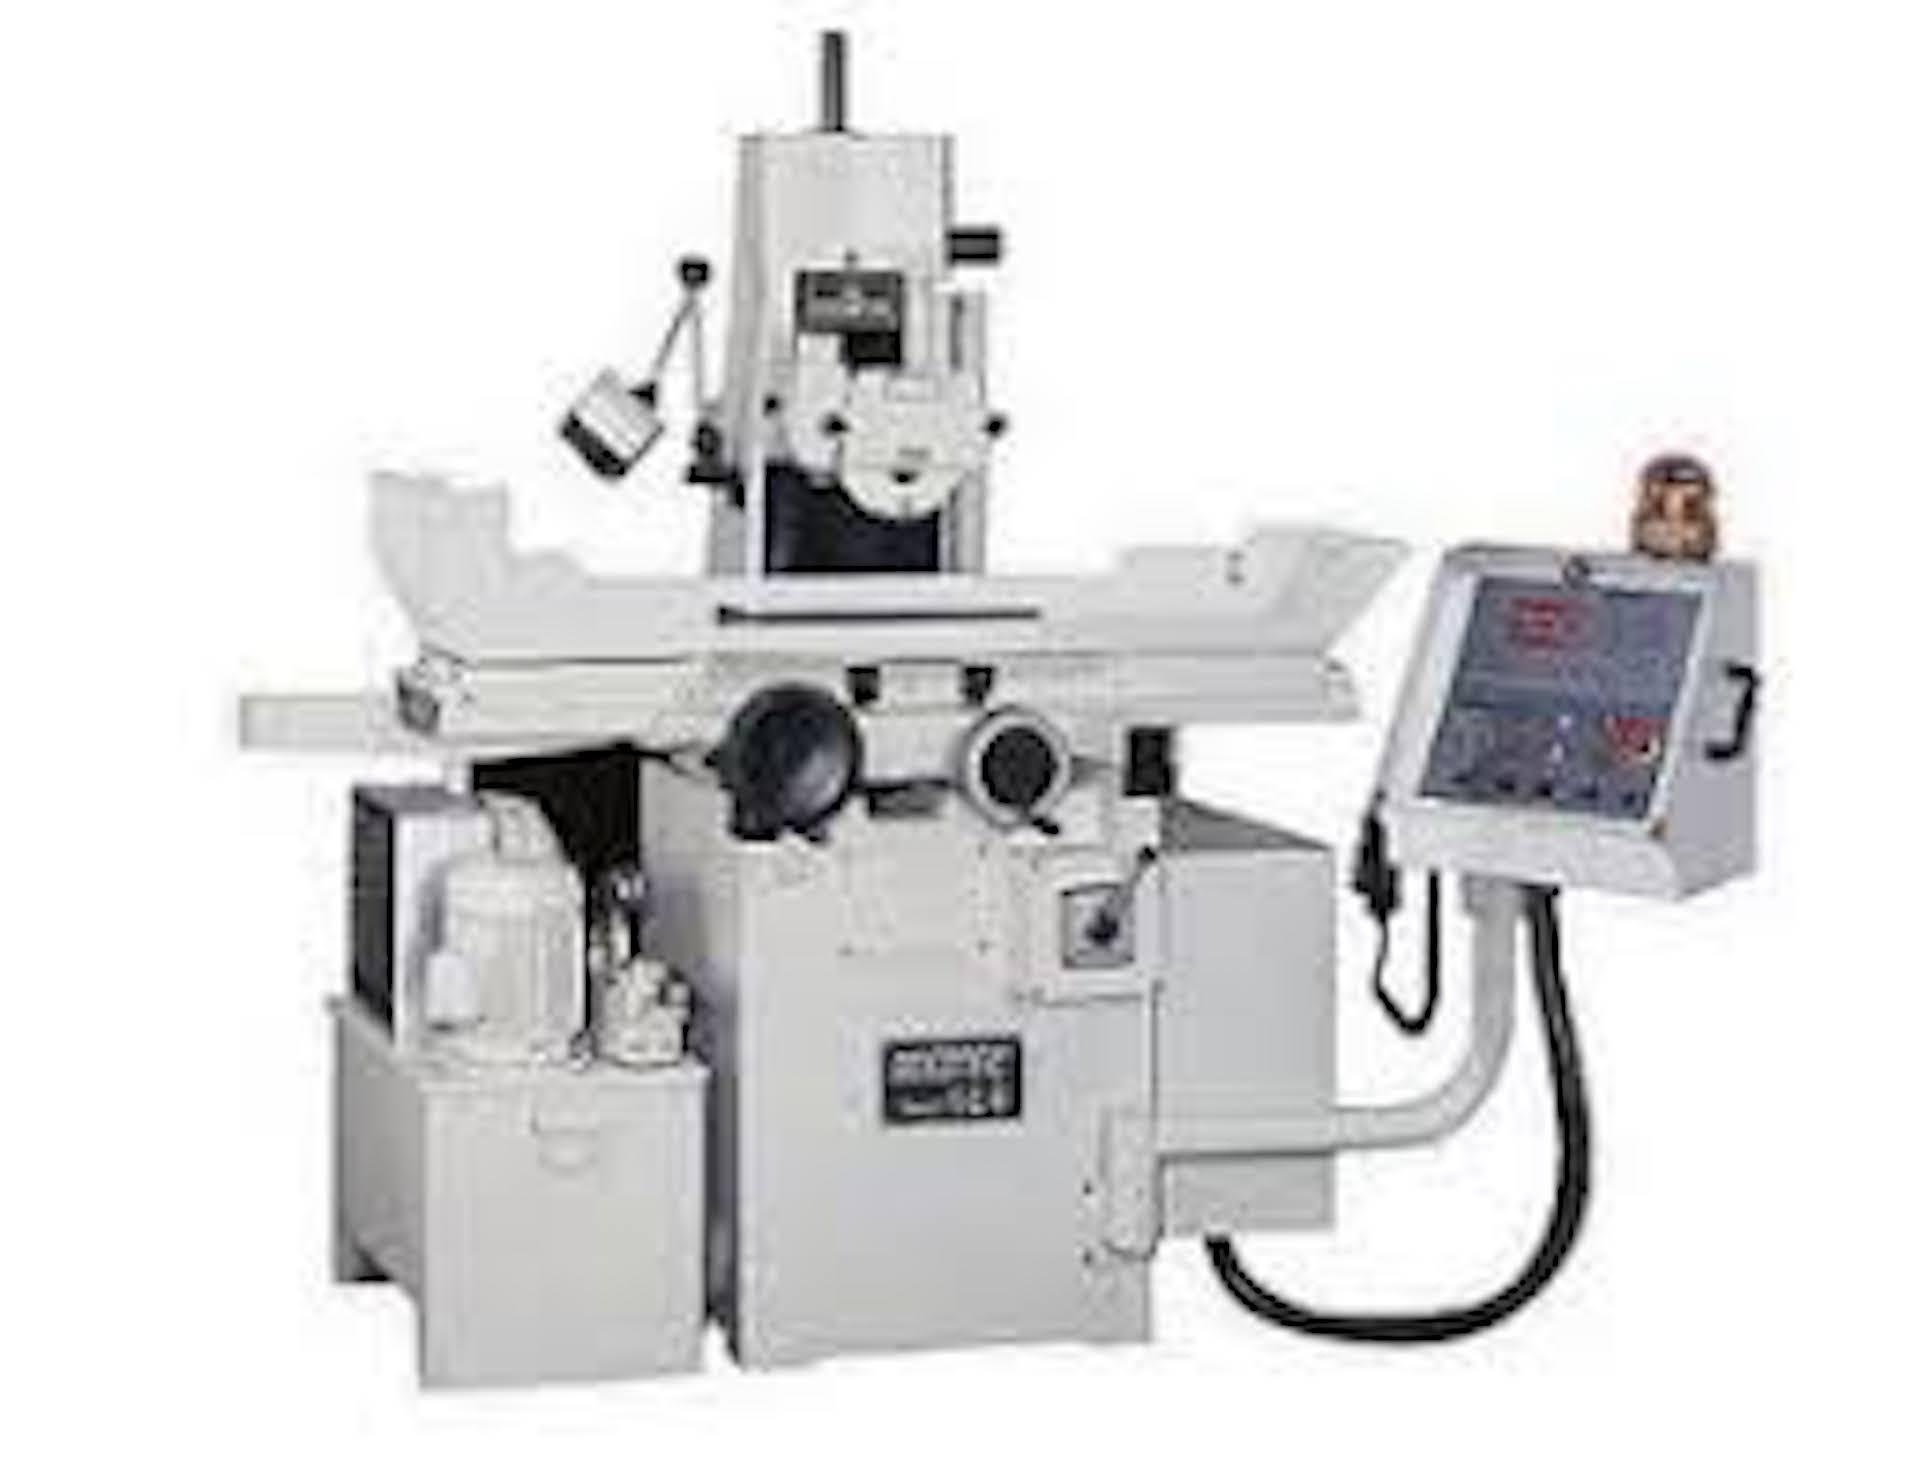 https://www.metalite.co.uk/wp-content/uploads/capabilities/surface-grinding/Andmar-618.jpg